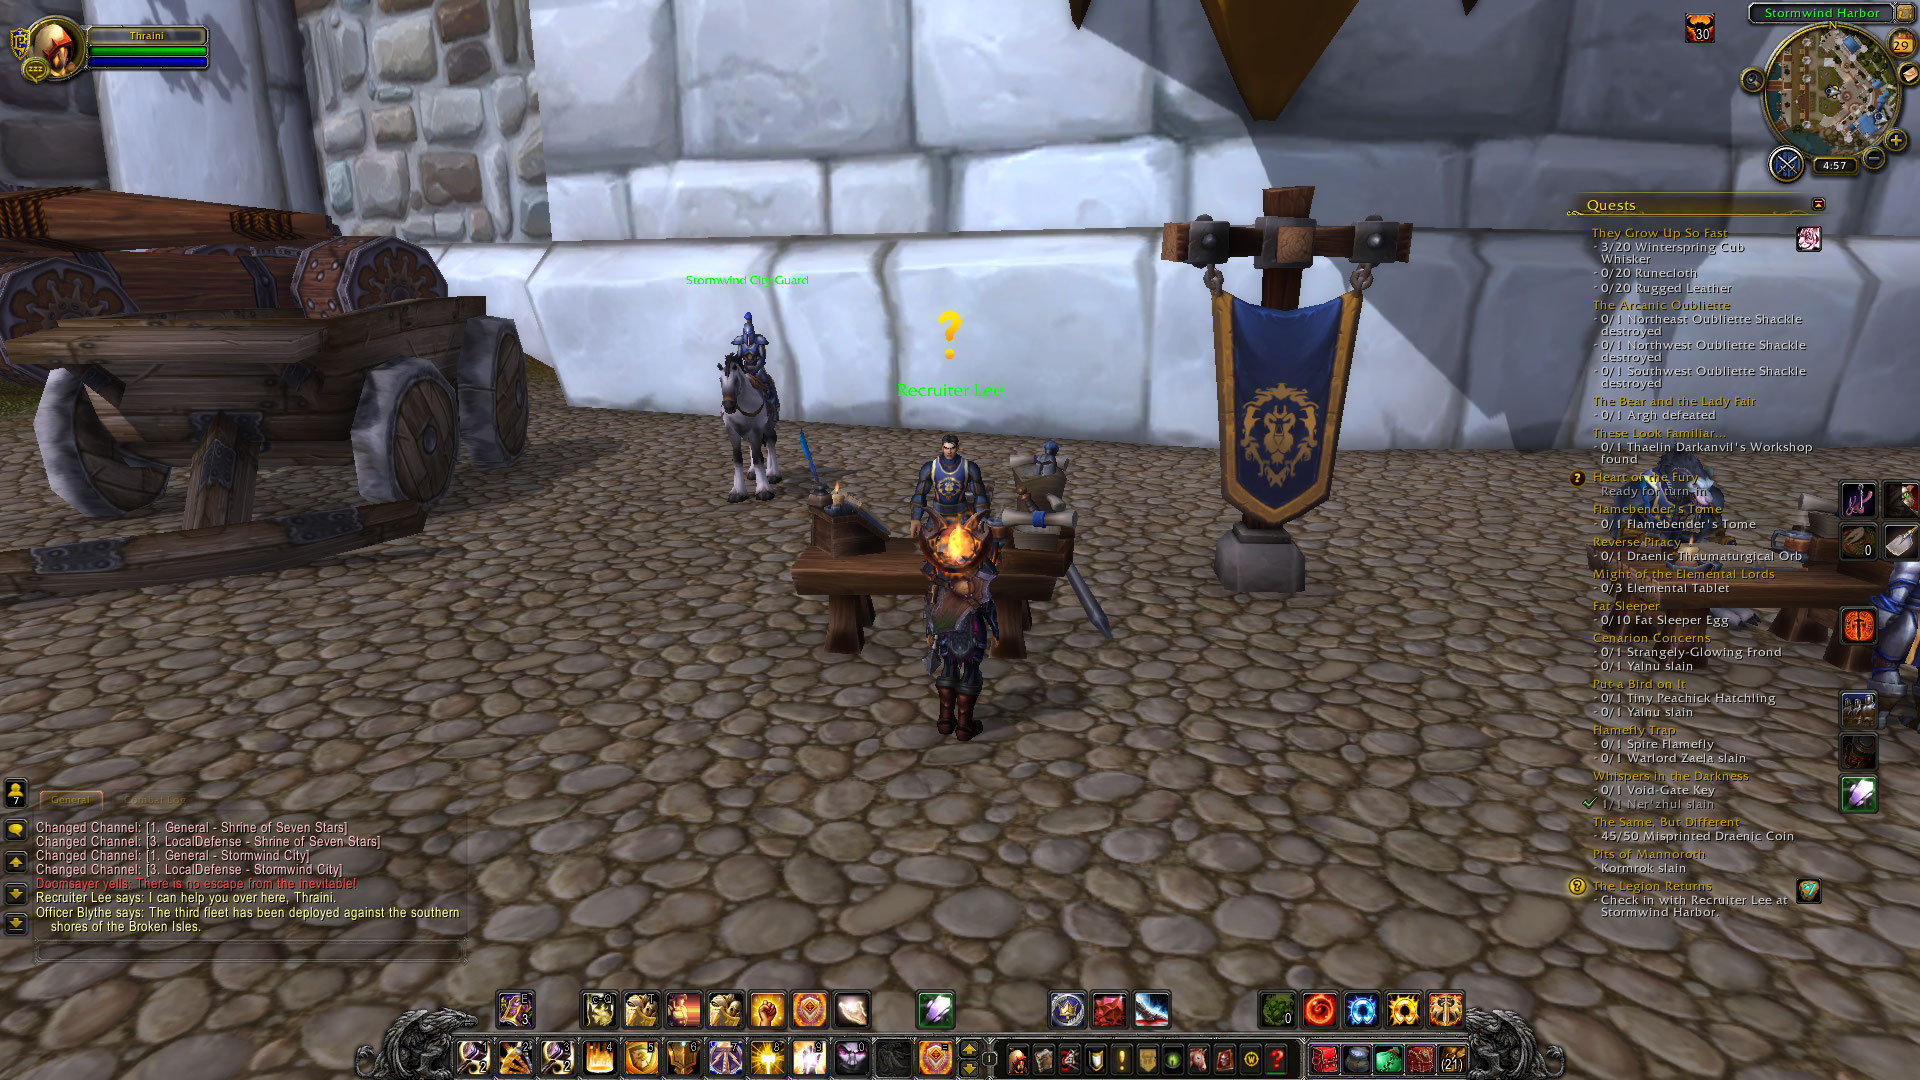 World of Warcraft: Legion fotoseriál - Plamenná legie přichází 129819